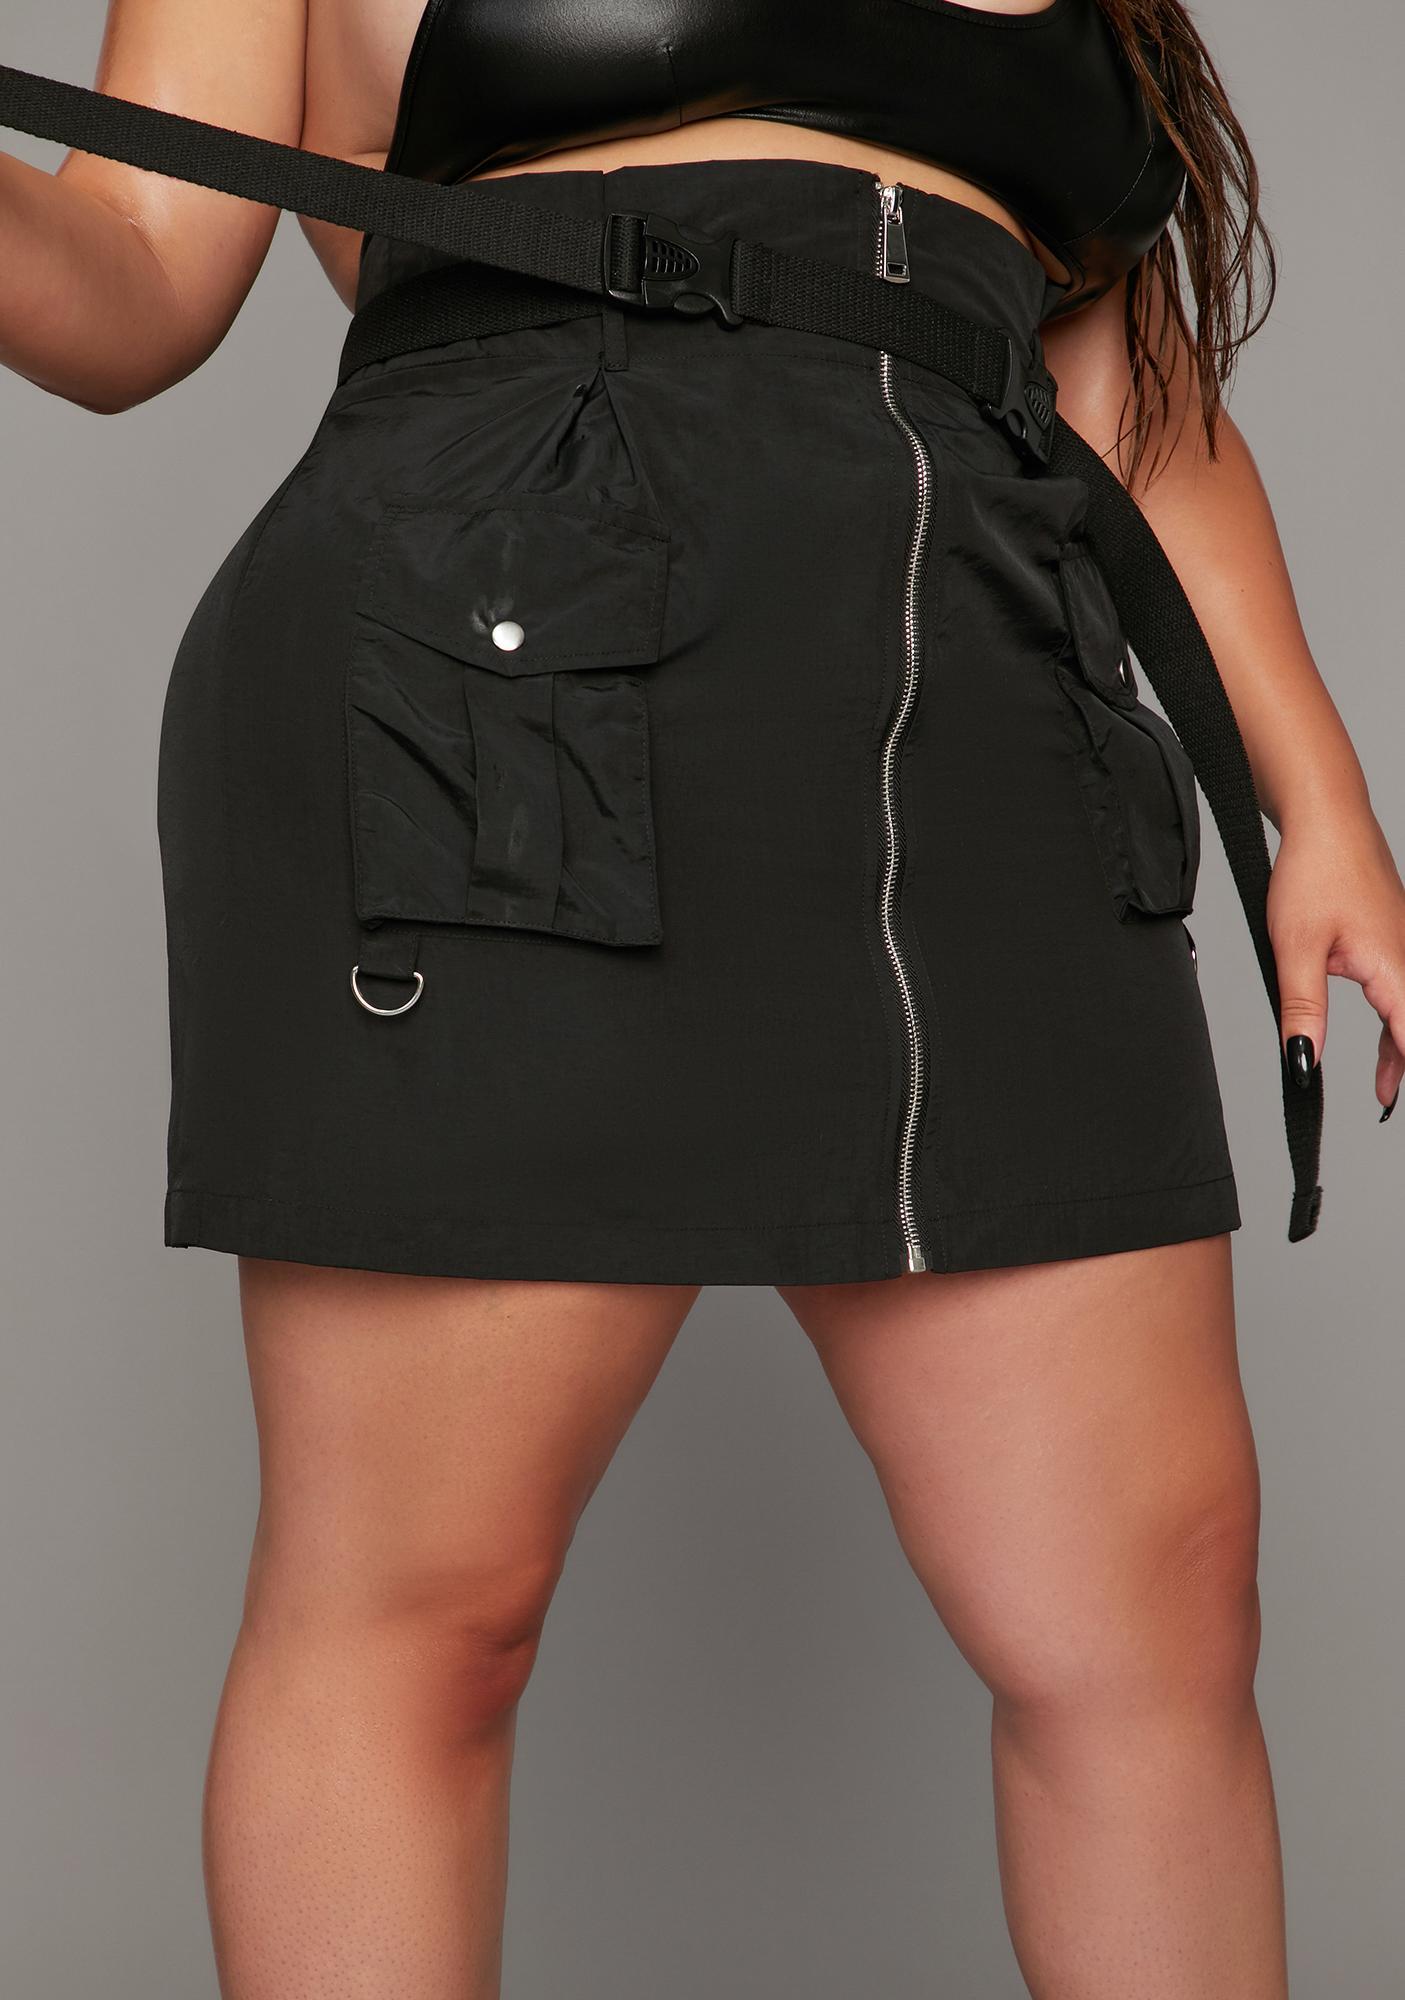 Poster Grl Always Take The Title Cargo Skirt